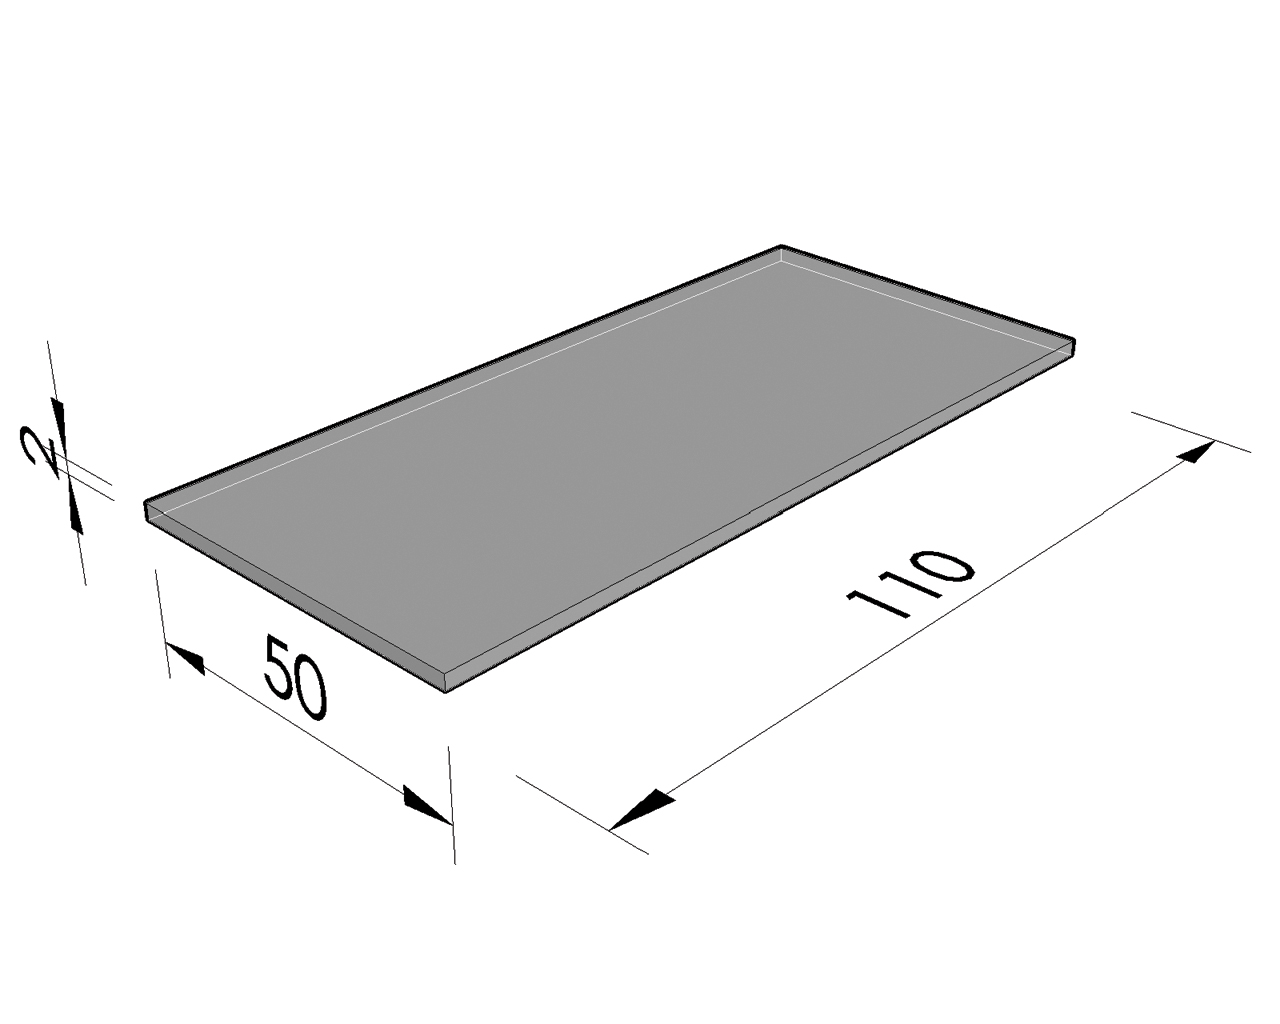 plaque de couverture cellule quadrangulaire 45 cellules quadrangulaires 45 columbaria. Black Bedroom Furniture Sets. Home Design Ideas